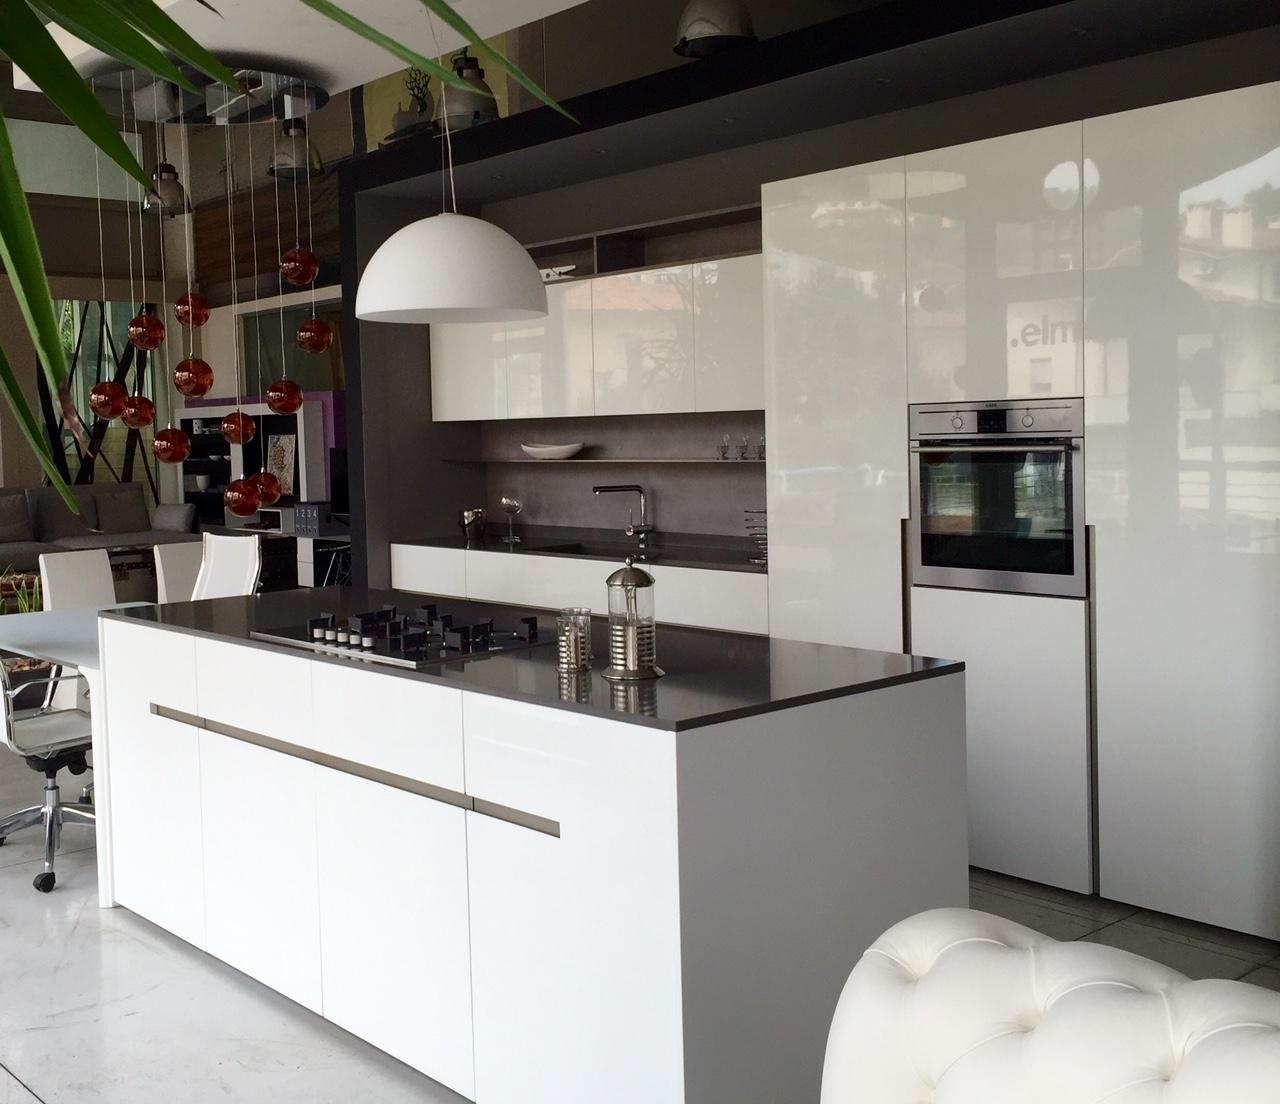 Cucina Elmar Cucine Home Cube Home Design Laccato Lucido